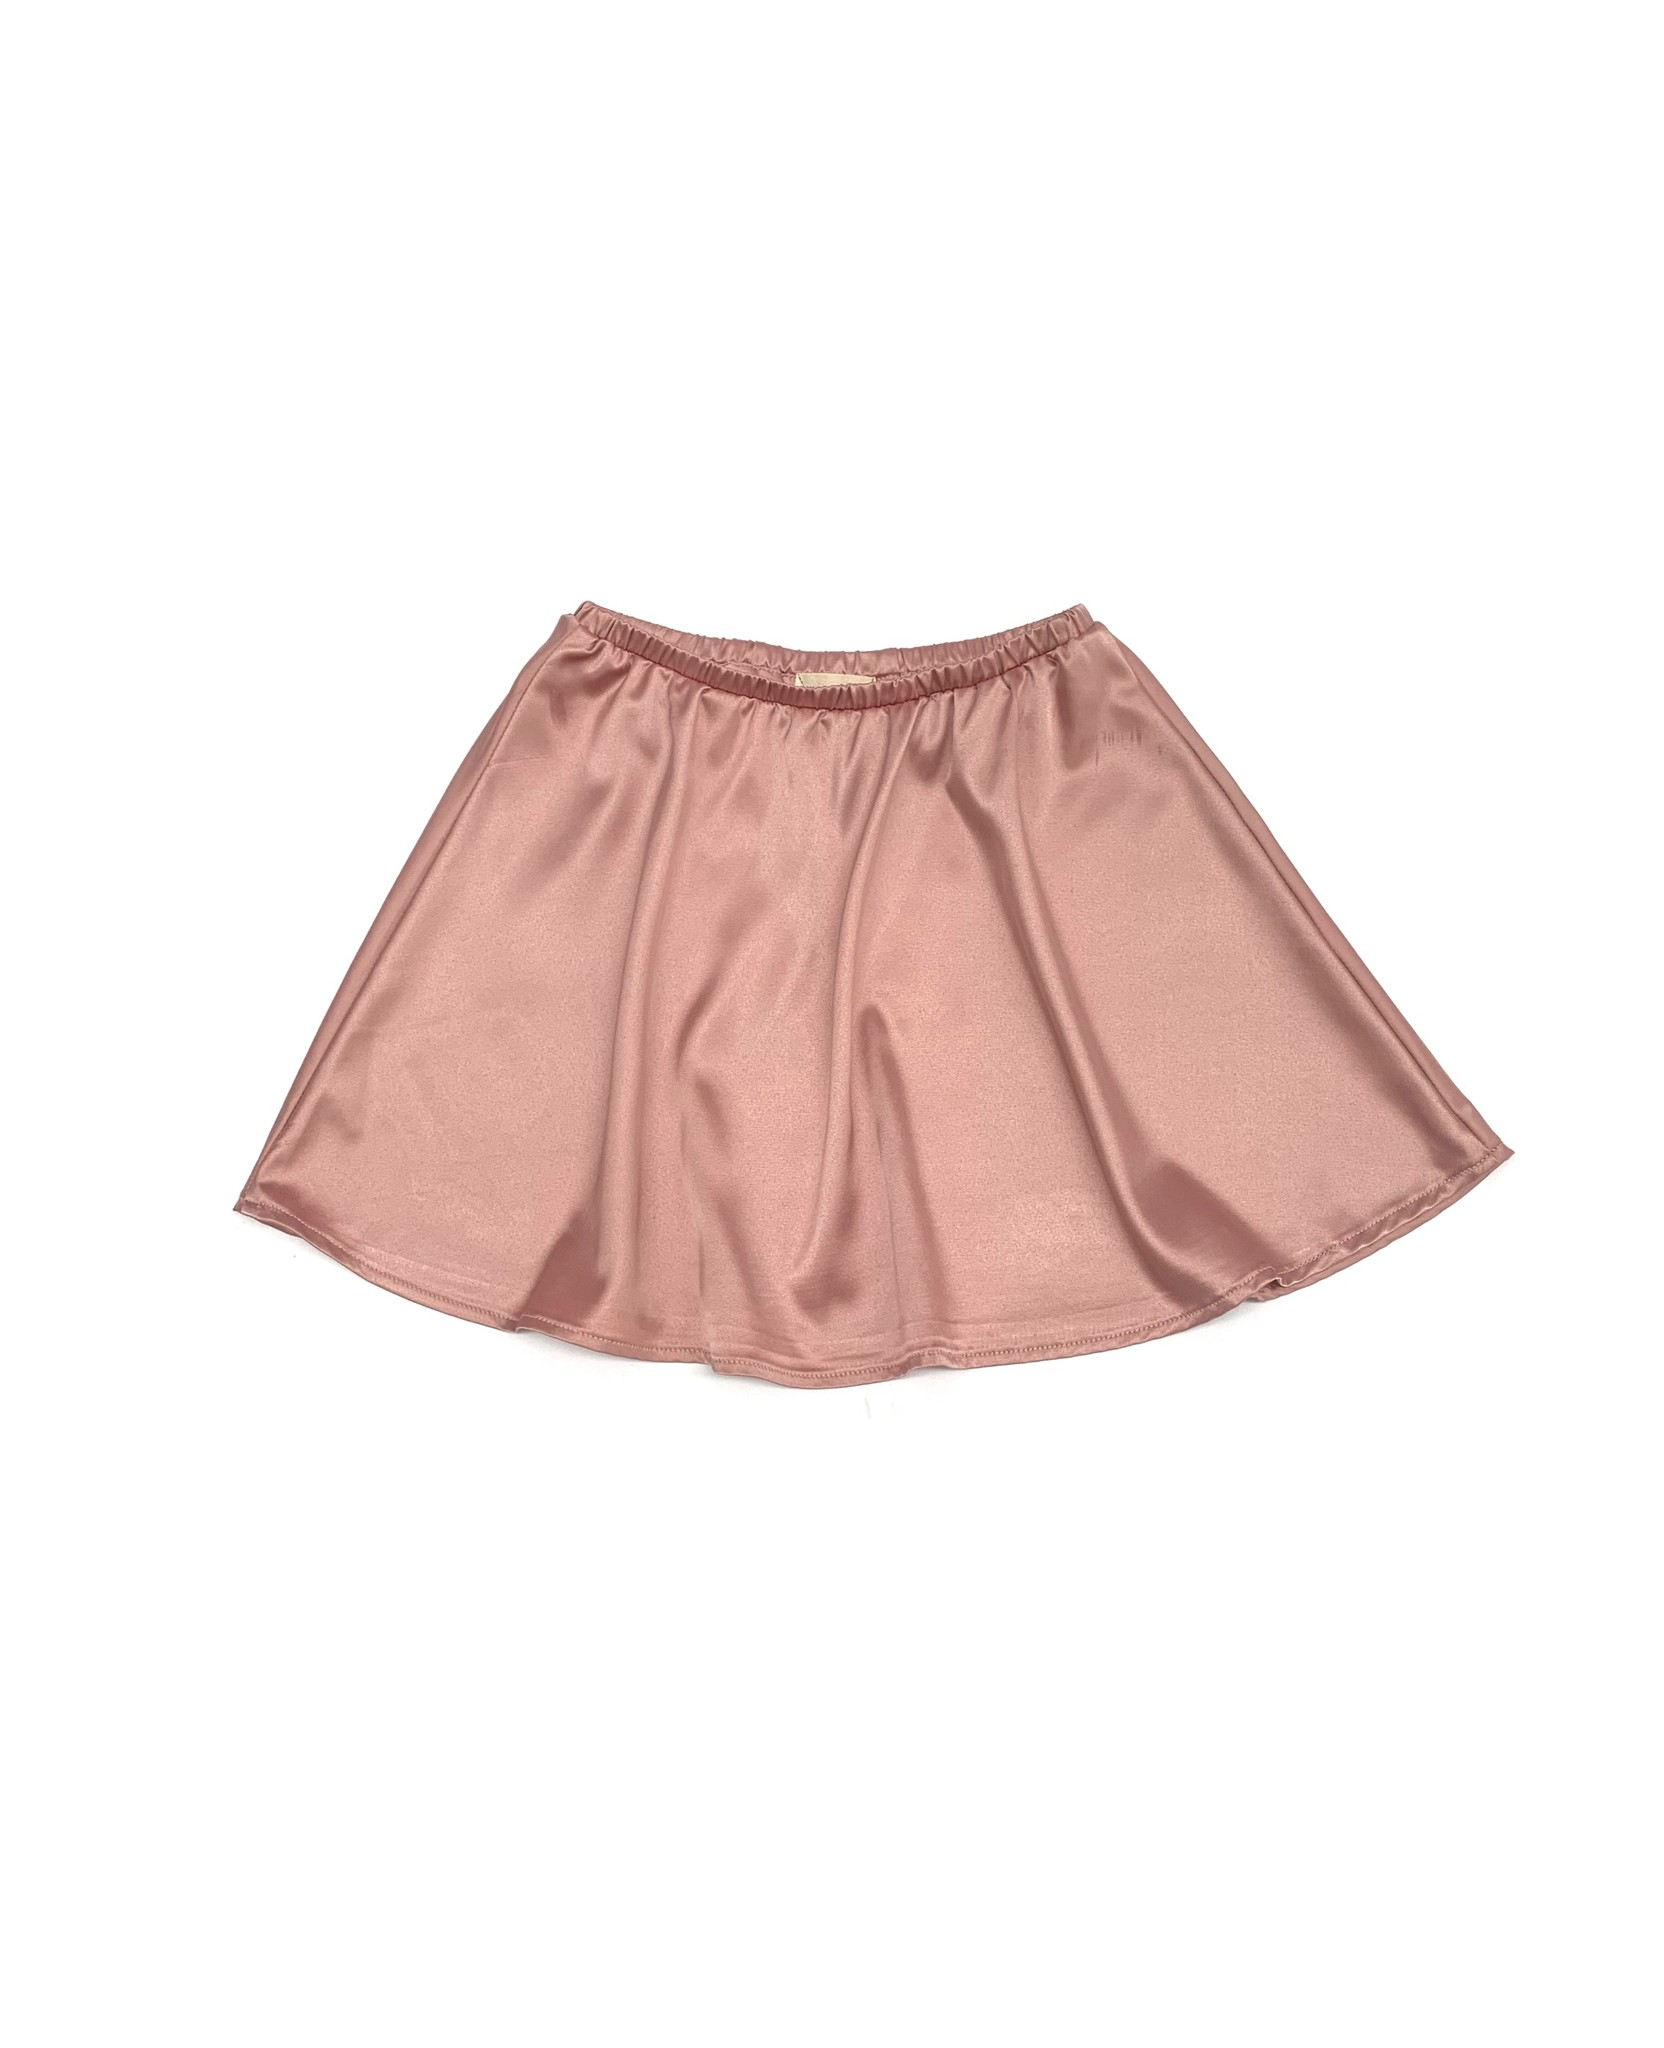 Flared satin skirt - Ballerina-1